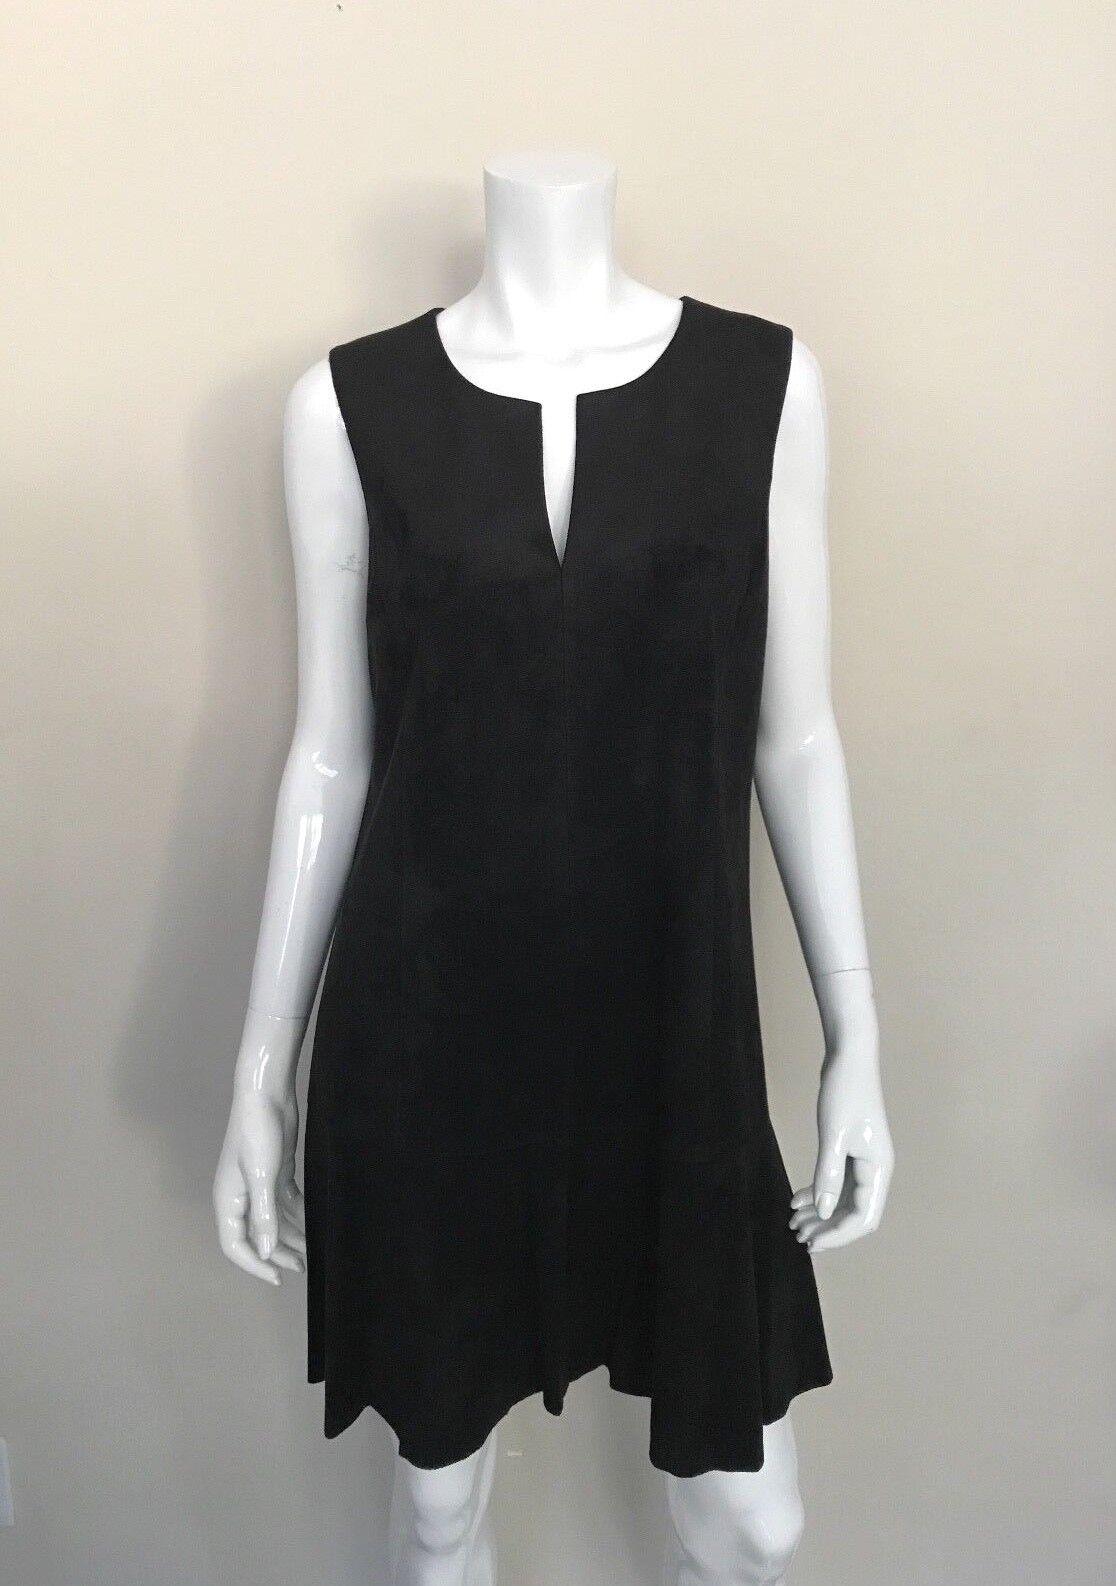 BCBGMAXAZRIA NWT Medium schwarz Faux Suede Shift Adelene Dress Sleeveless  NEW